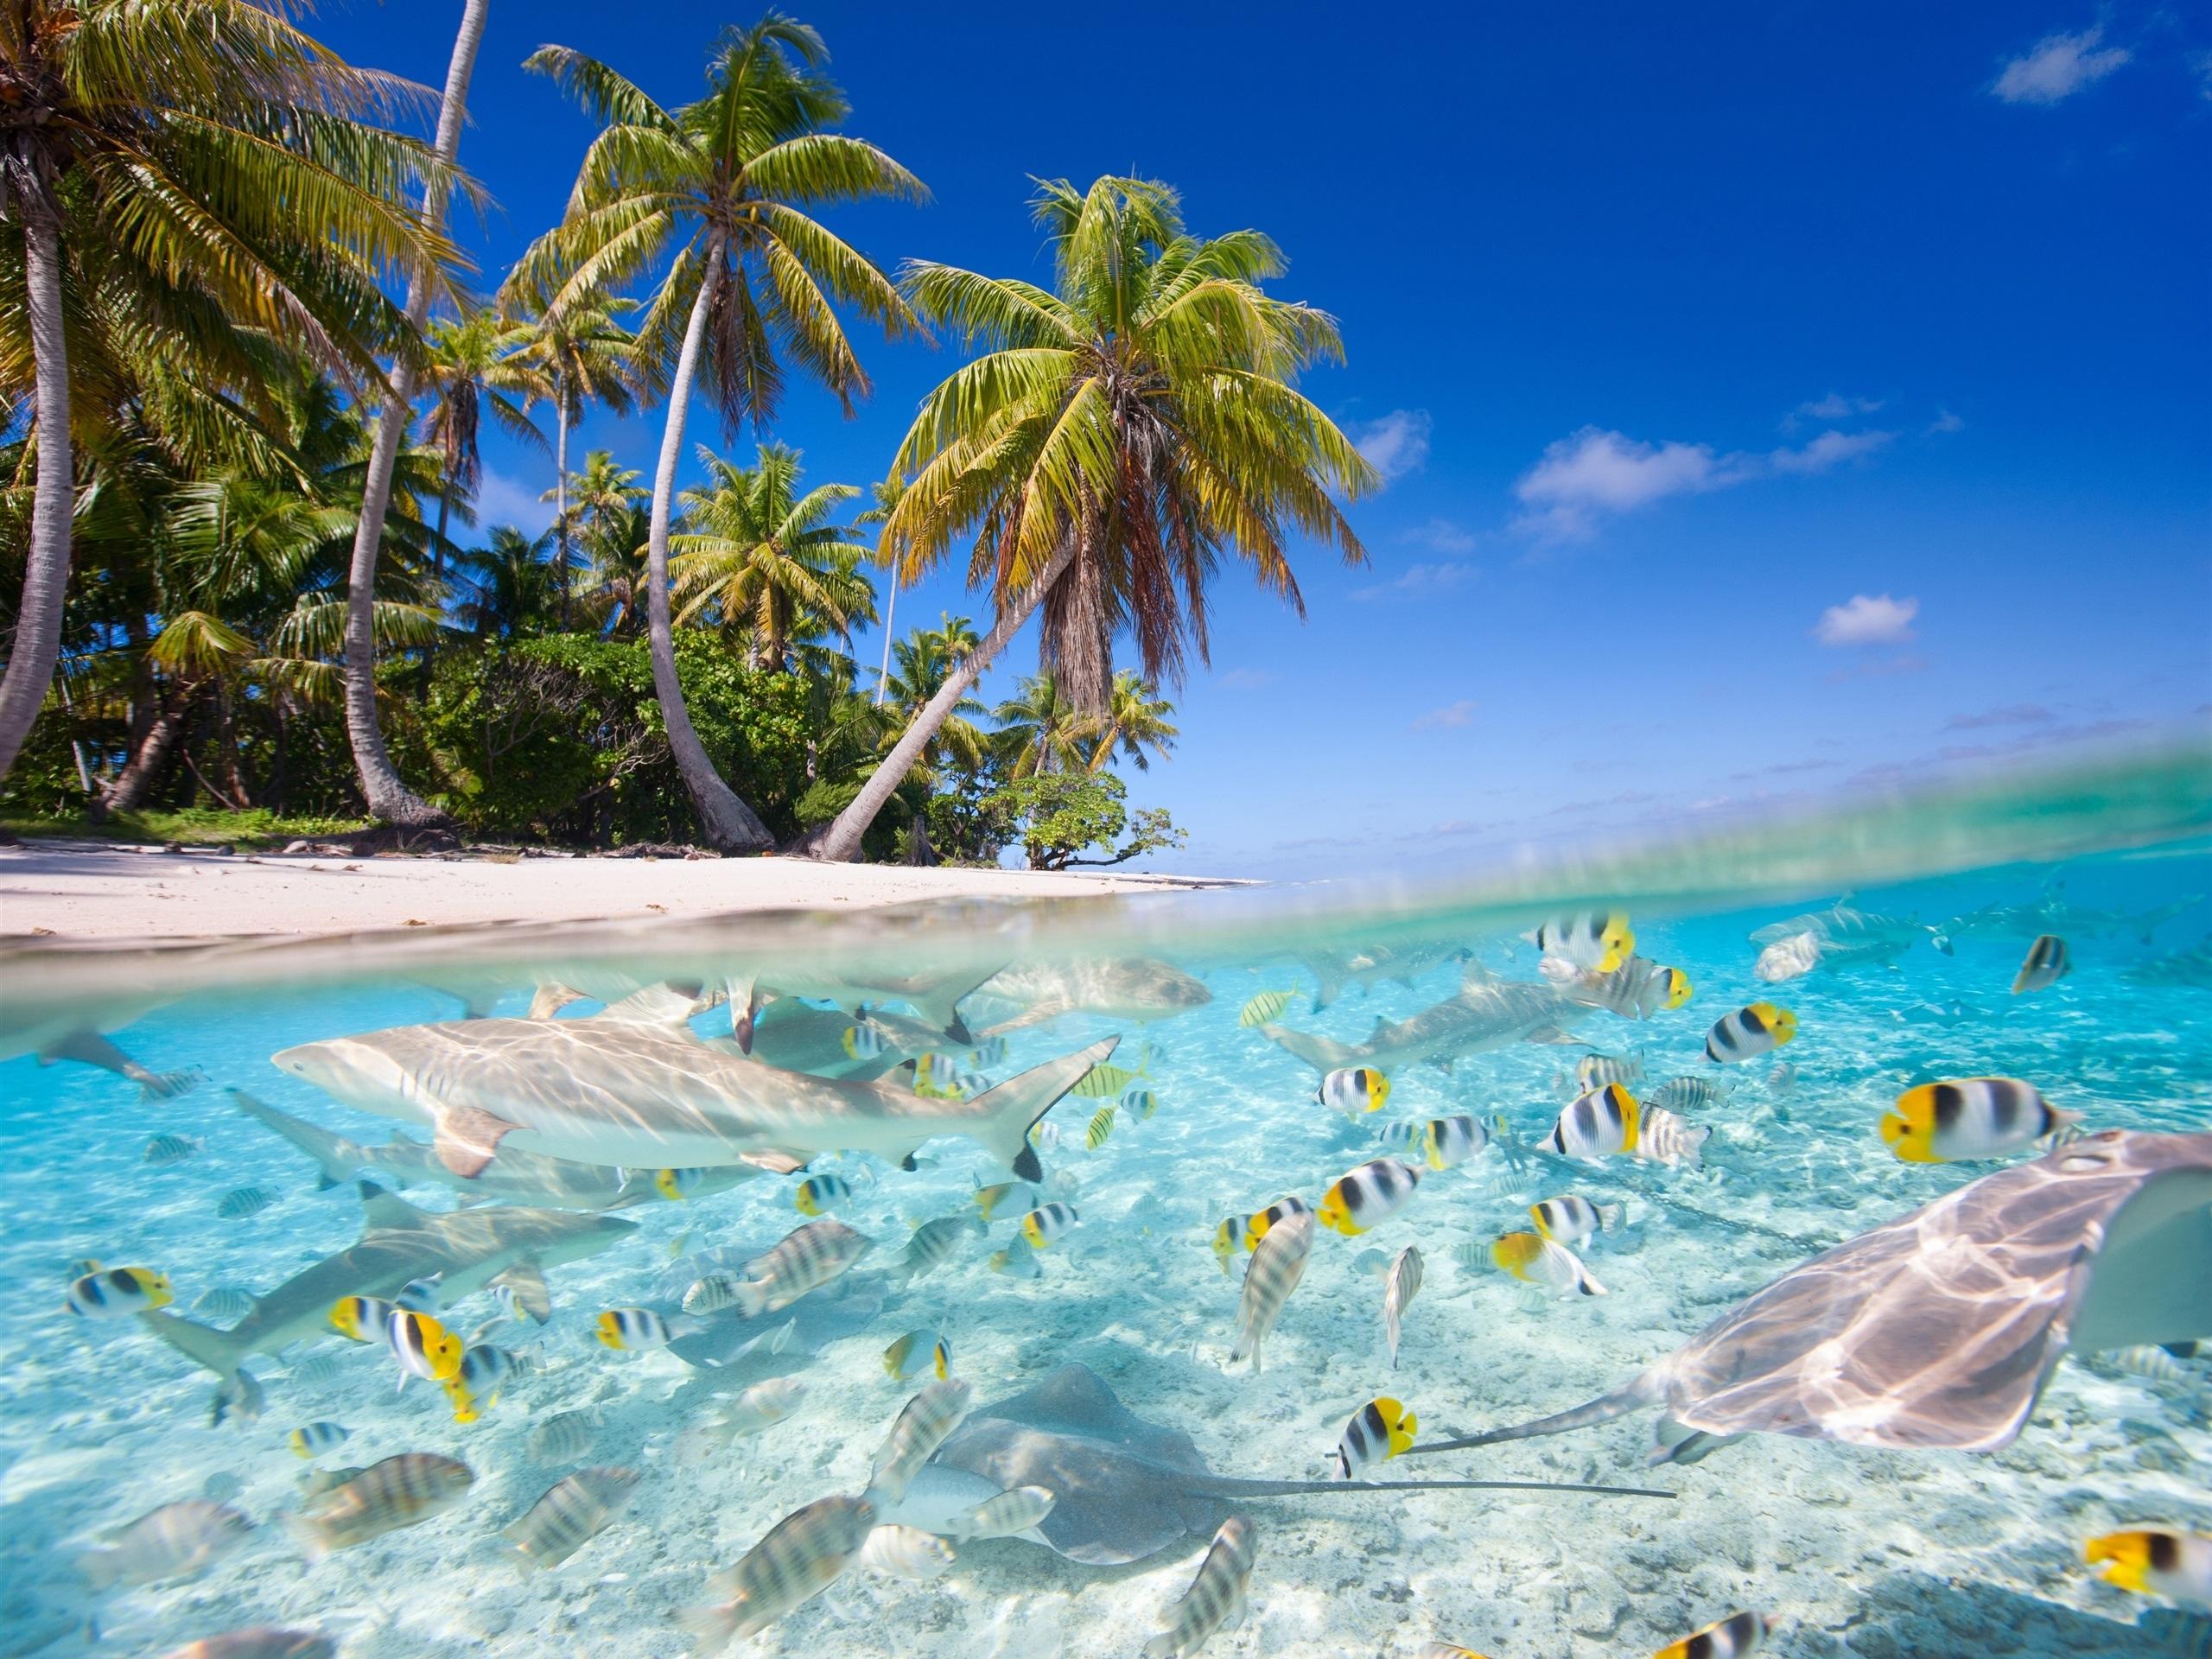 paisaje tropical mar playa palmeras peces tiburones